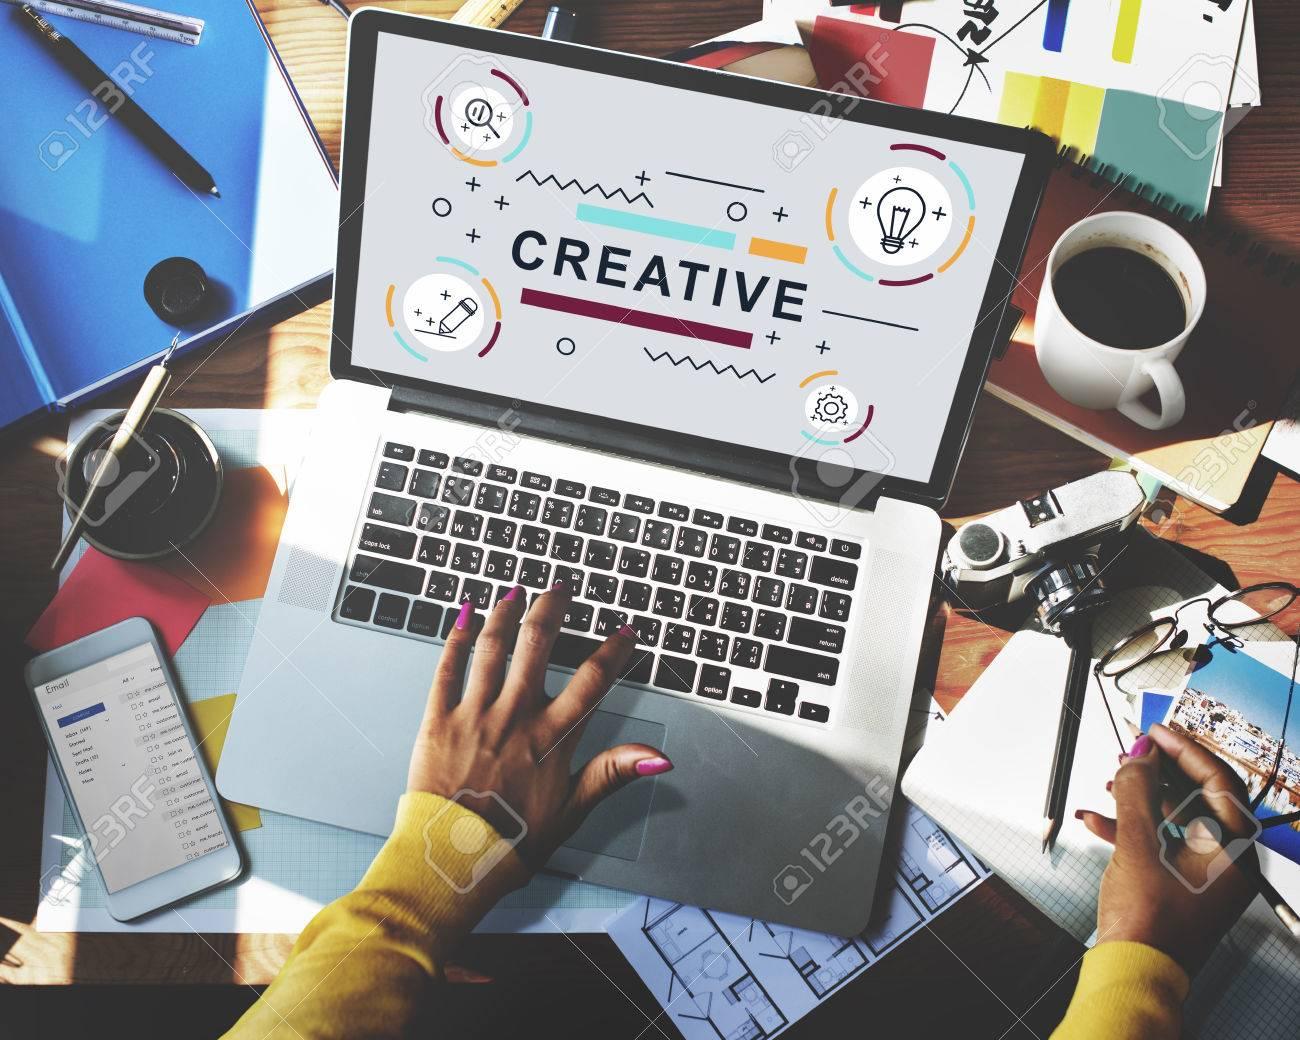 Design Creative Imagination Ideas Graphic Concept - 59432454